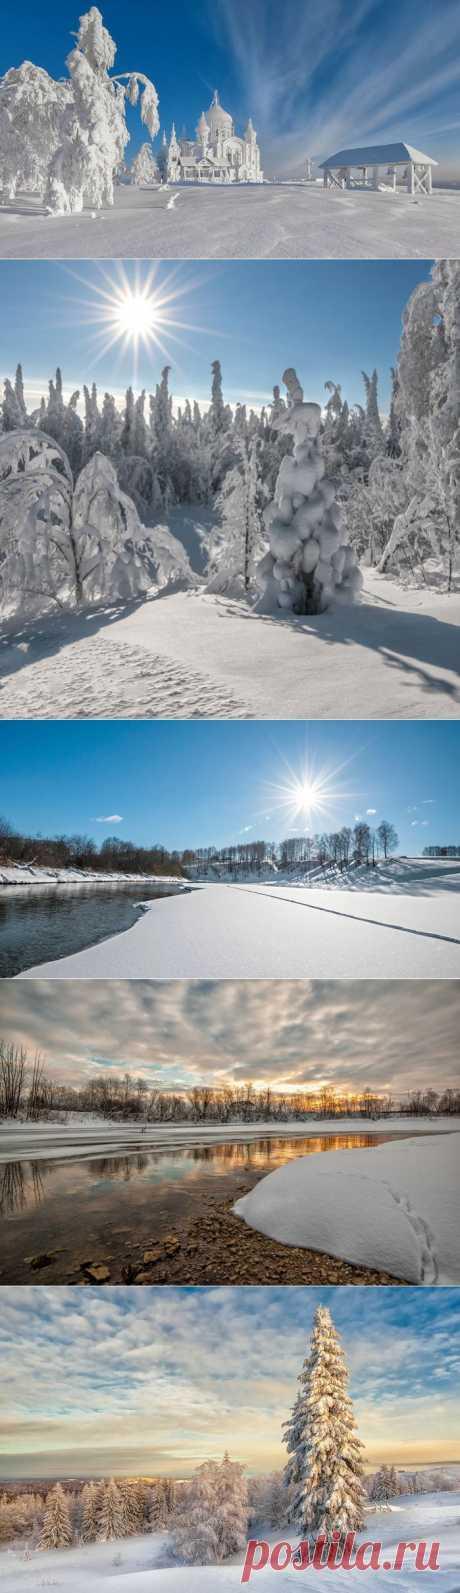 © Fantastic winter from the photographer Vladimir Chuprikov.